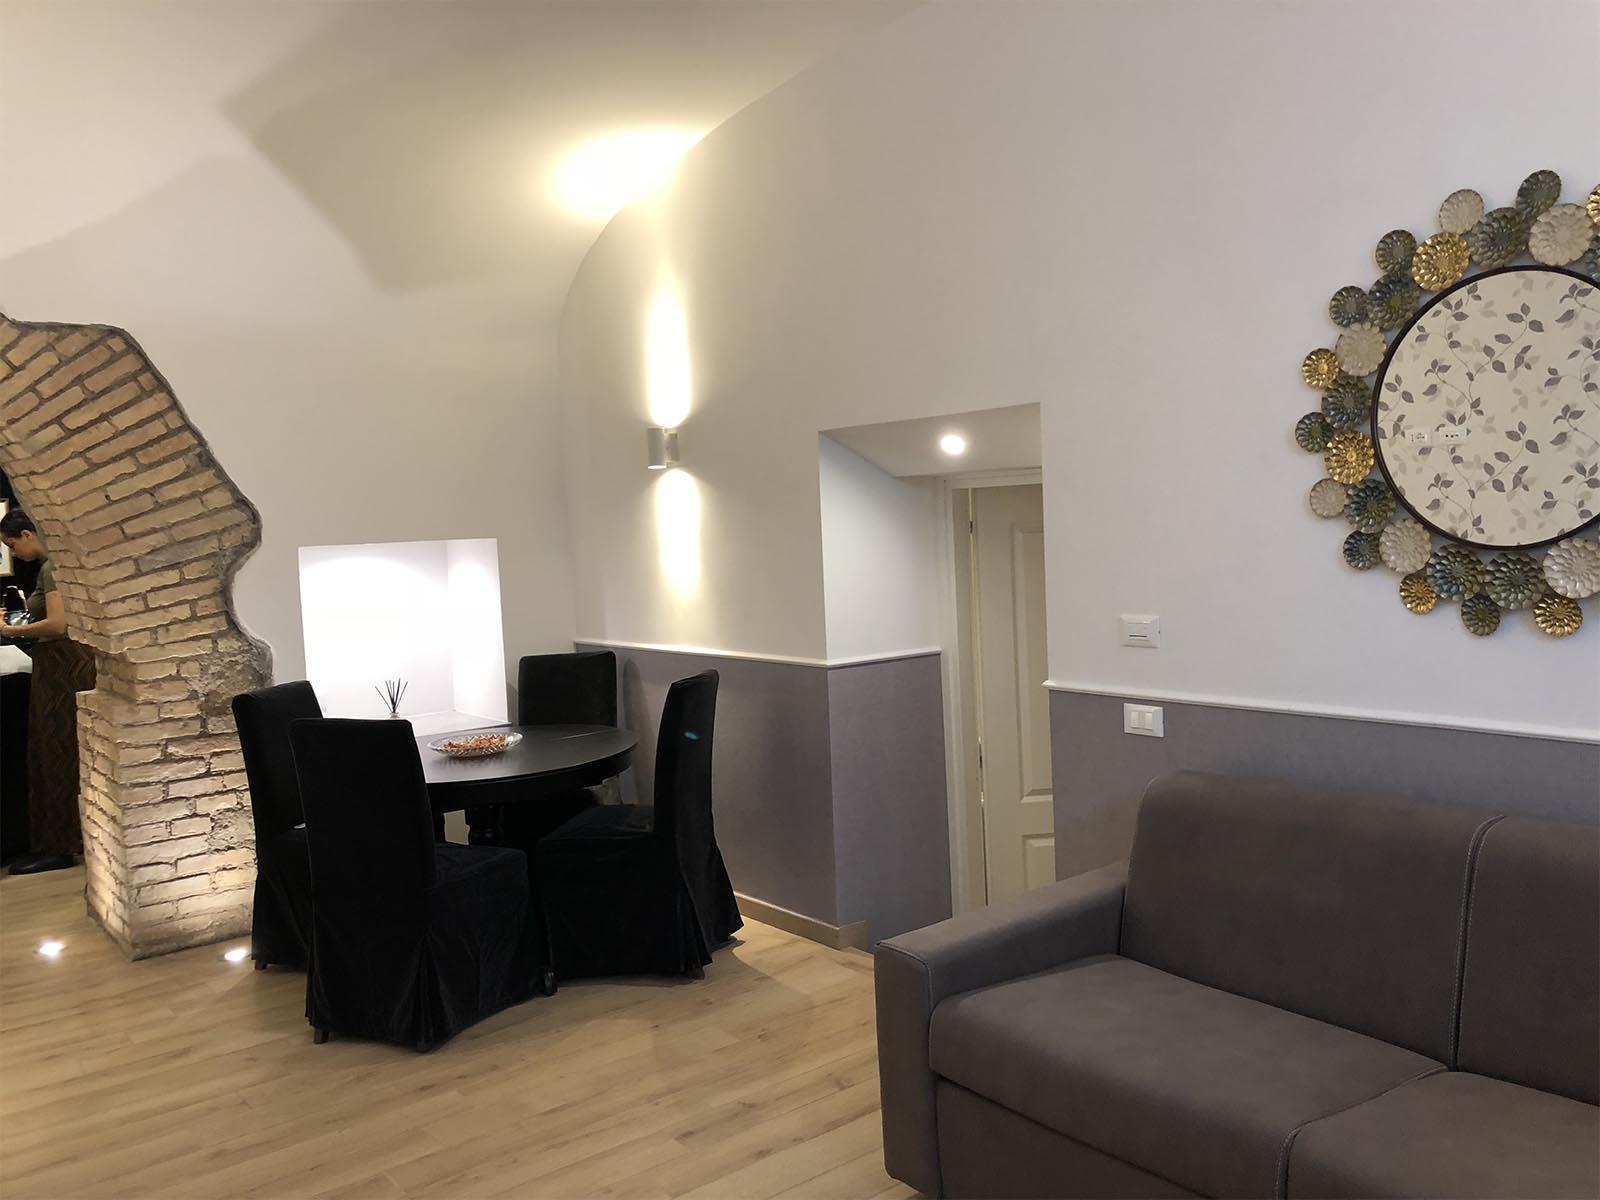 Giolitti Suite Interior 9